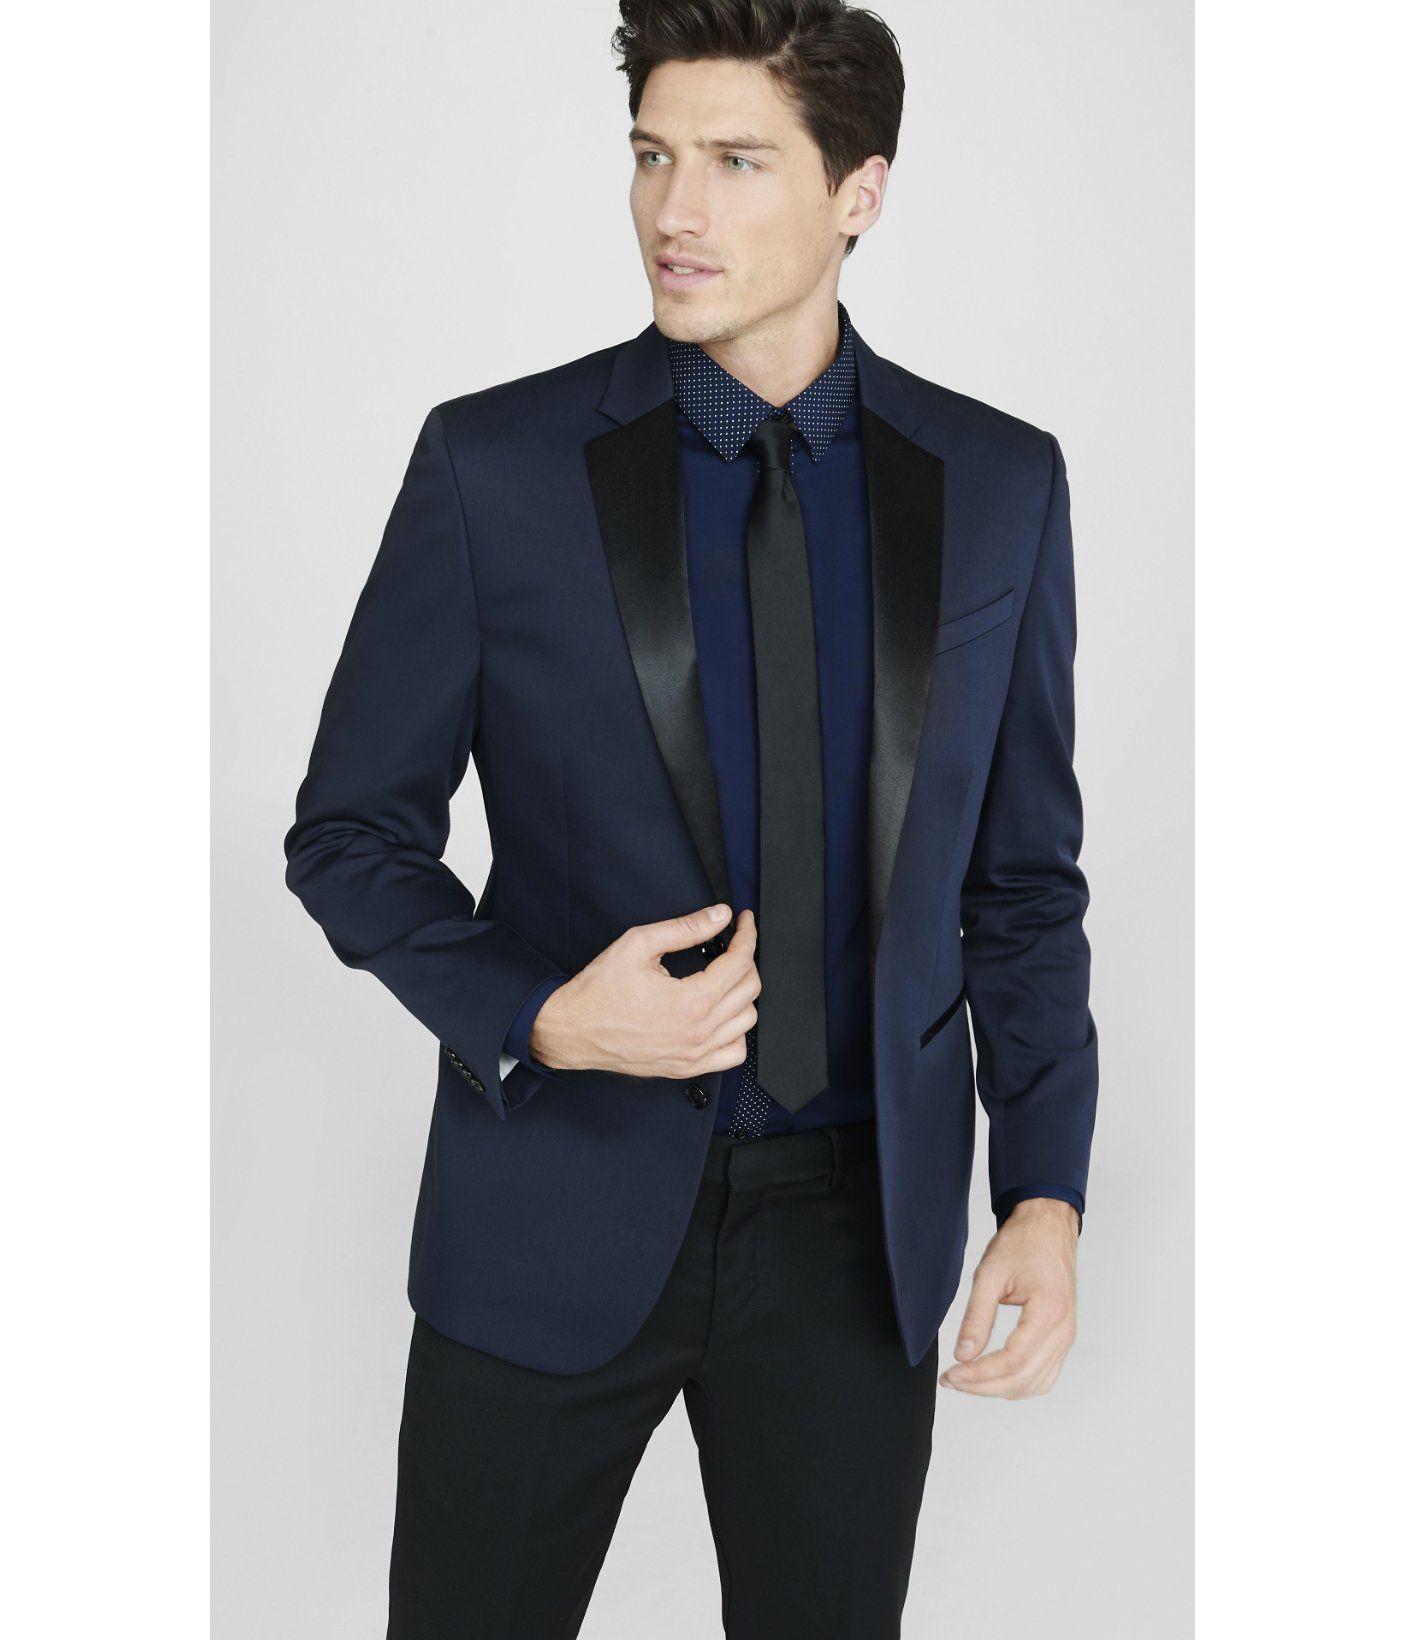 navy blue and black tuxedo Google Search Navy tuxedos